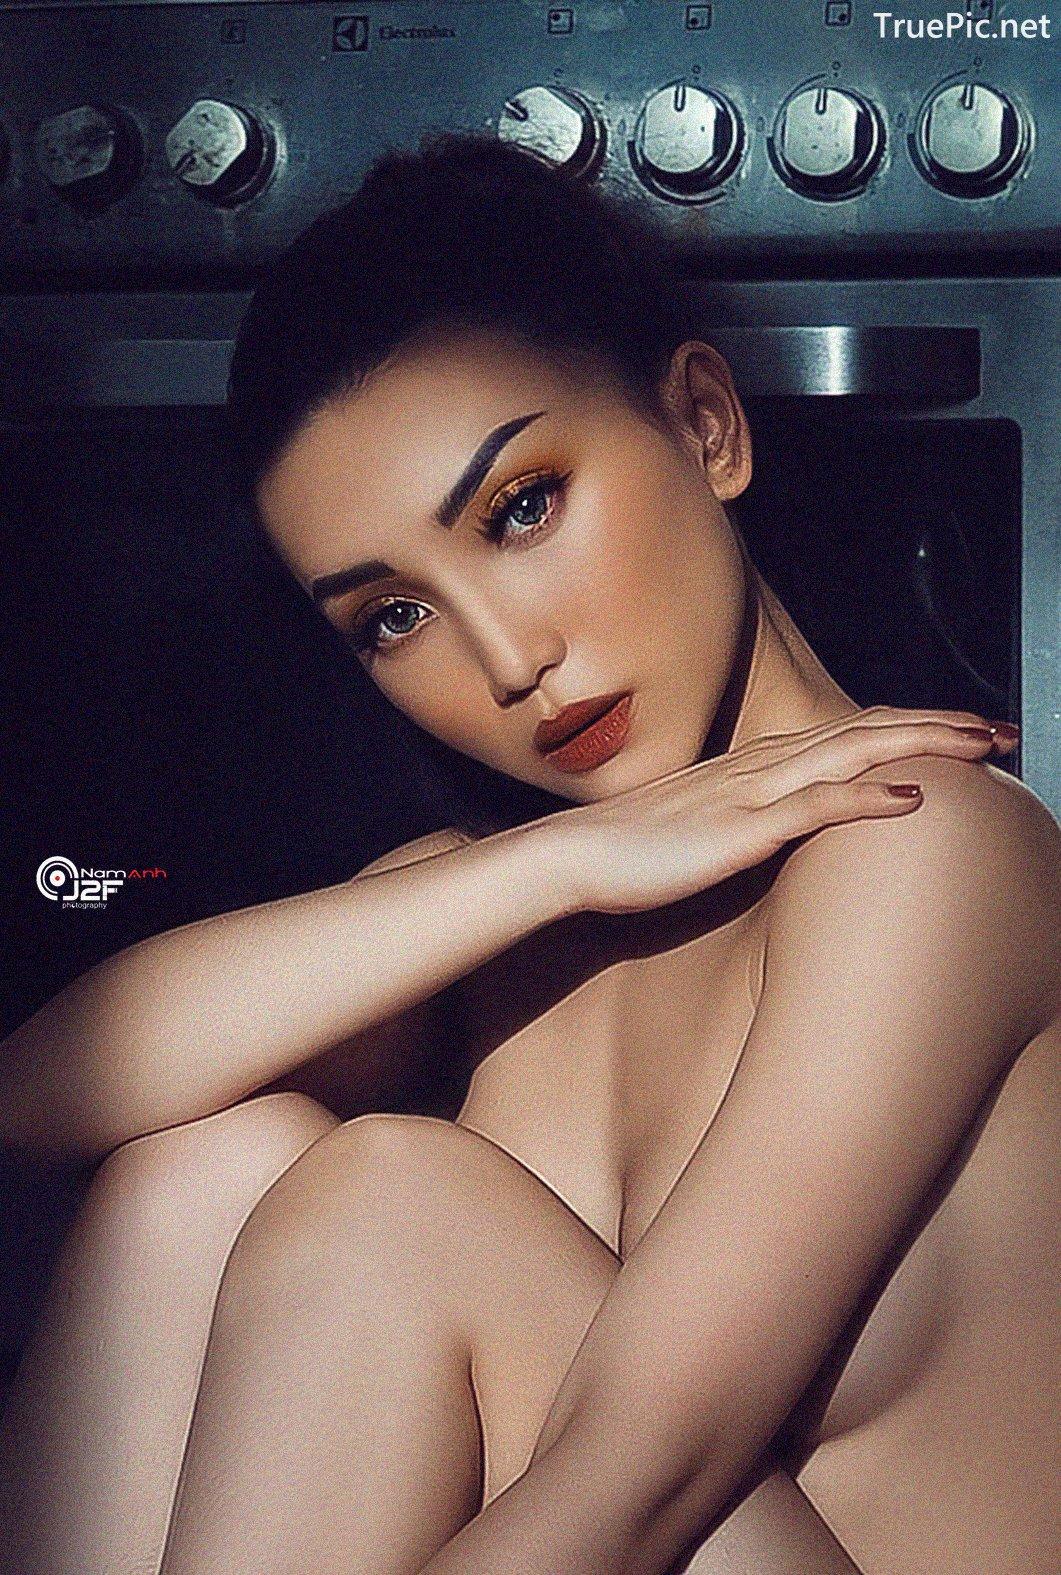 Image Vietnamese Model – Sexy Beauty of Beautiful Girls Taken by NamAnh Photo #7 - TruePic.net - Picture-13